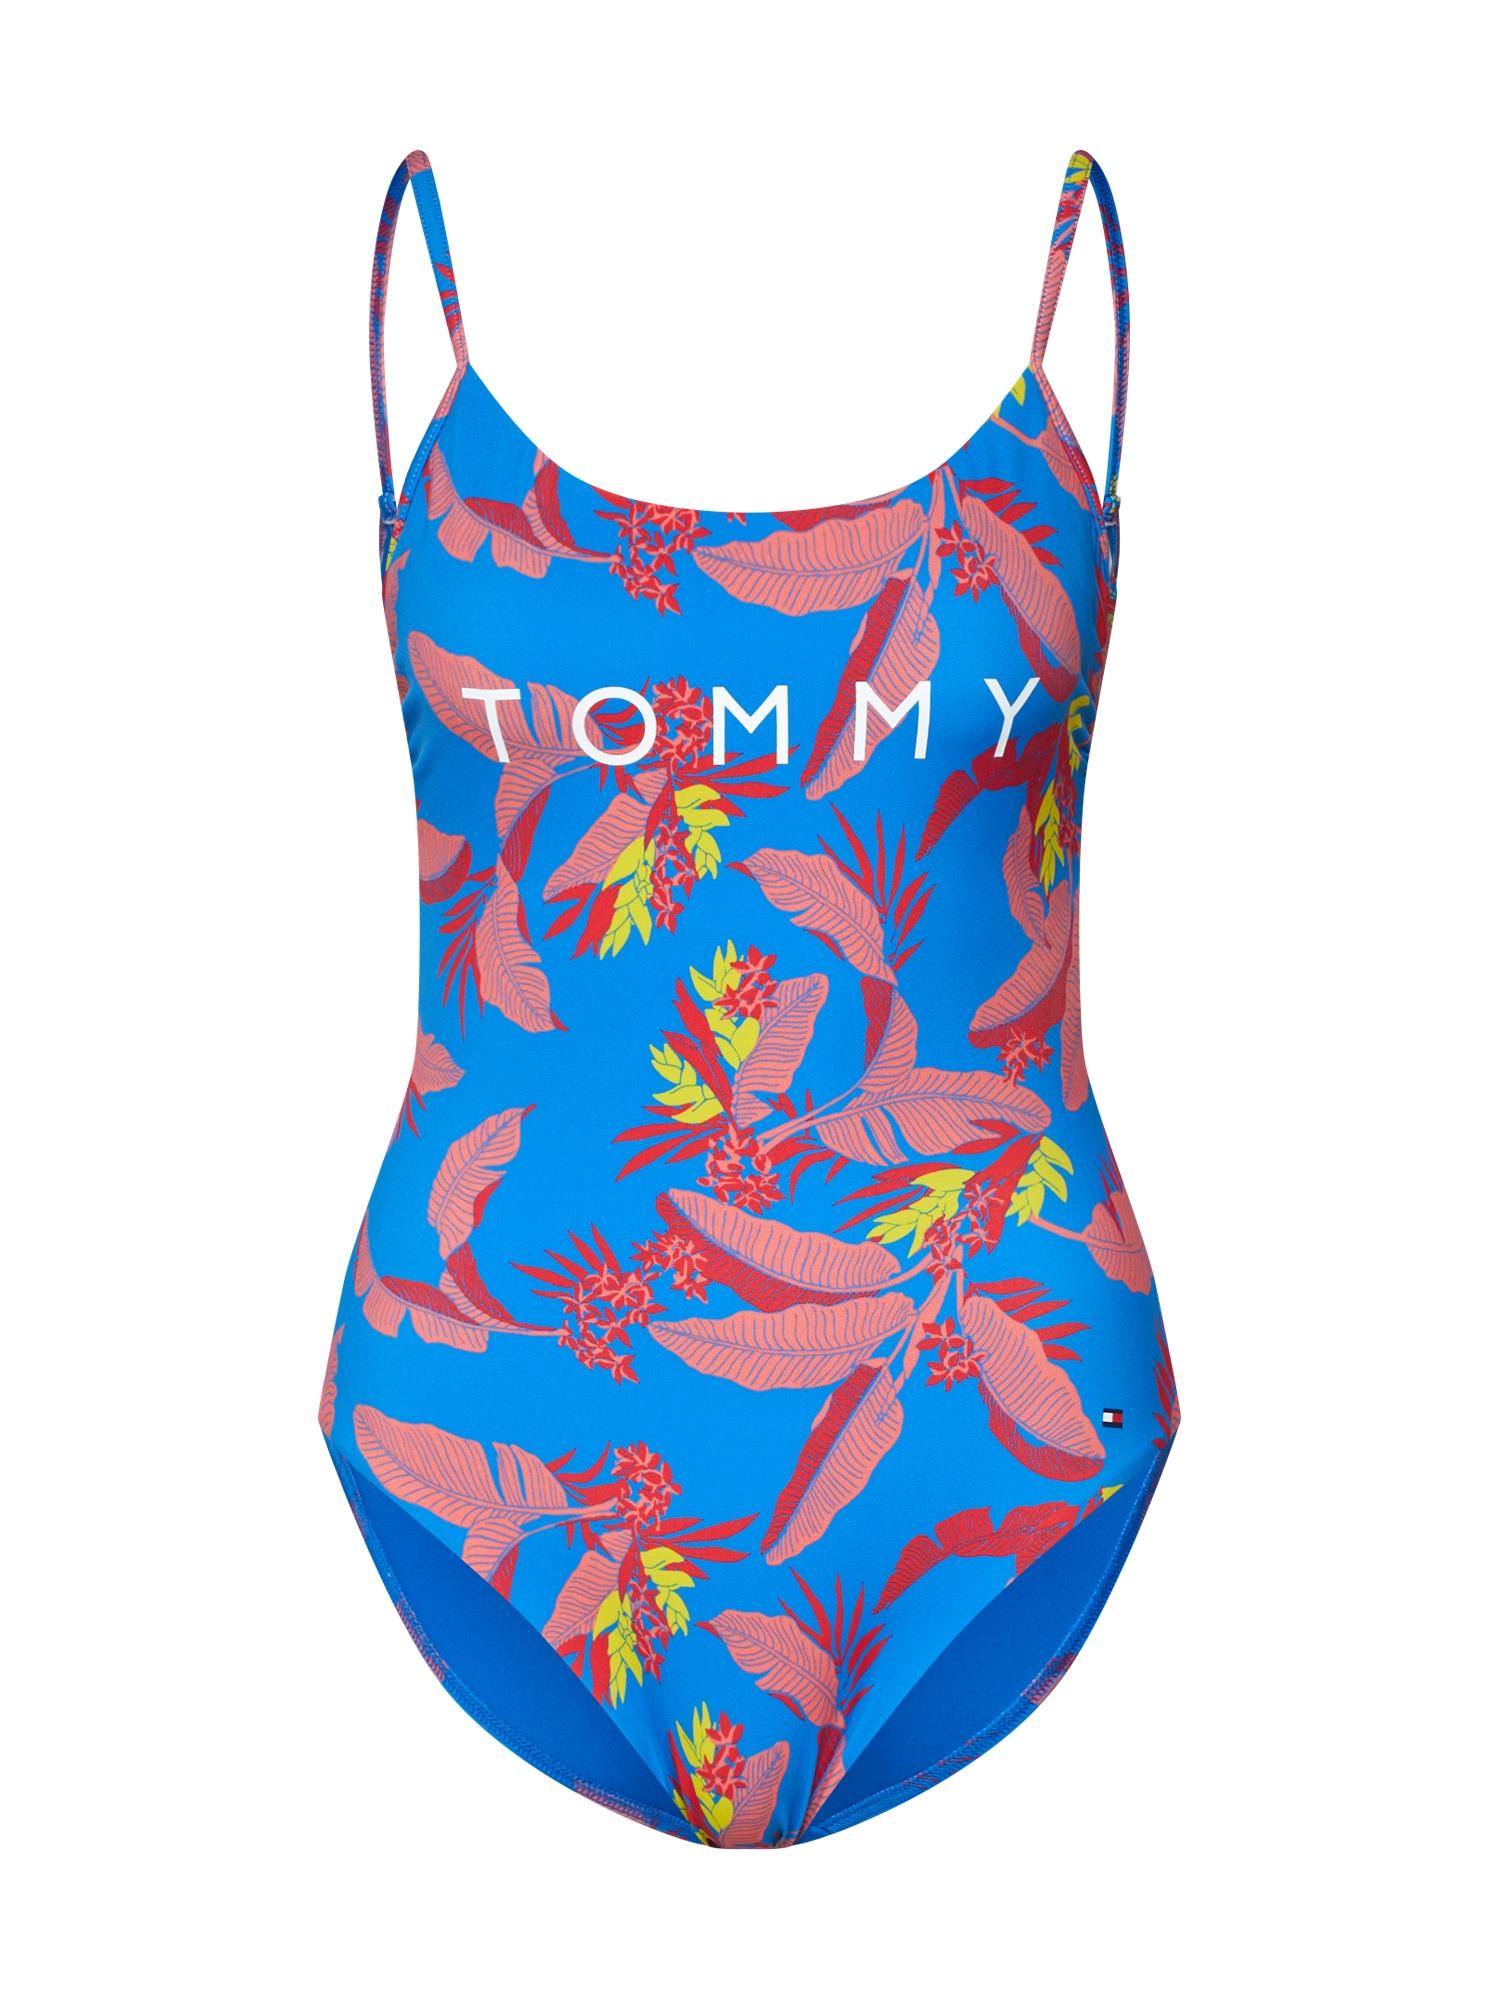 Plavky ONE-PIECE modrá mix barev Tommy Hilfiger Underwear